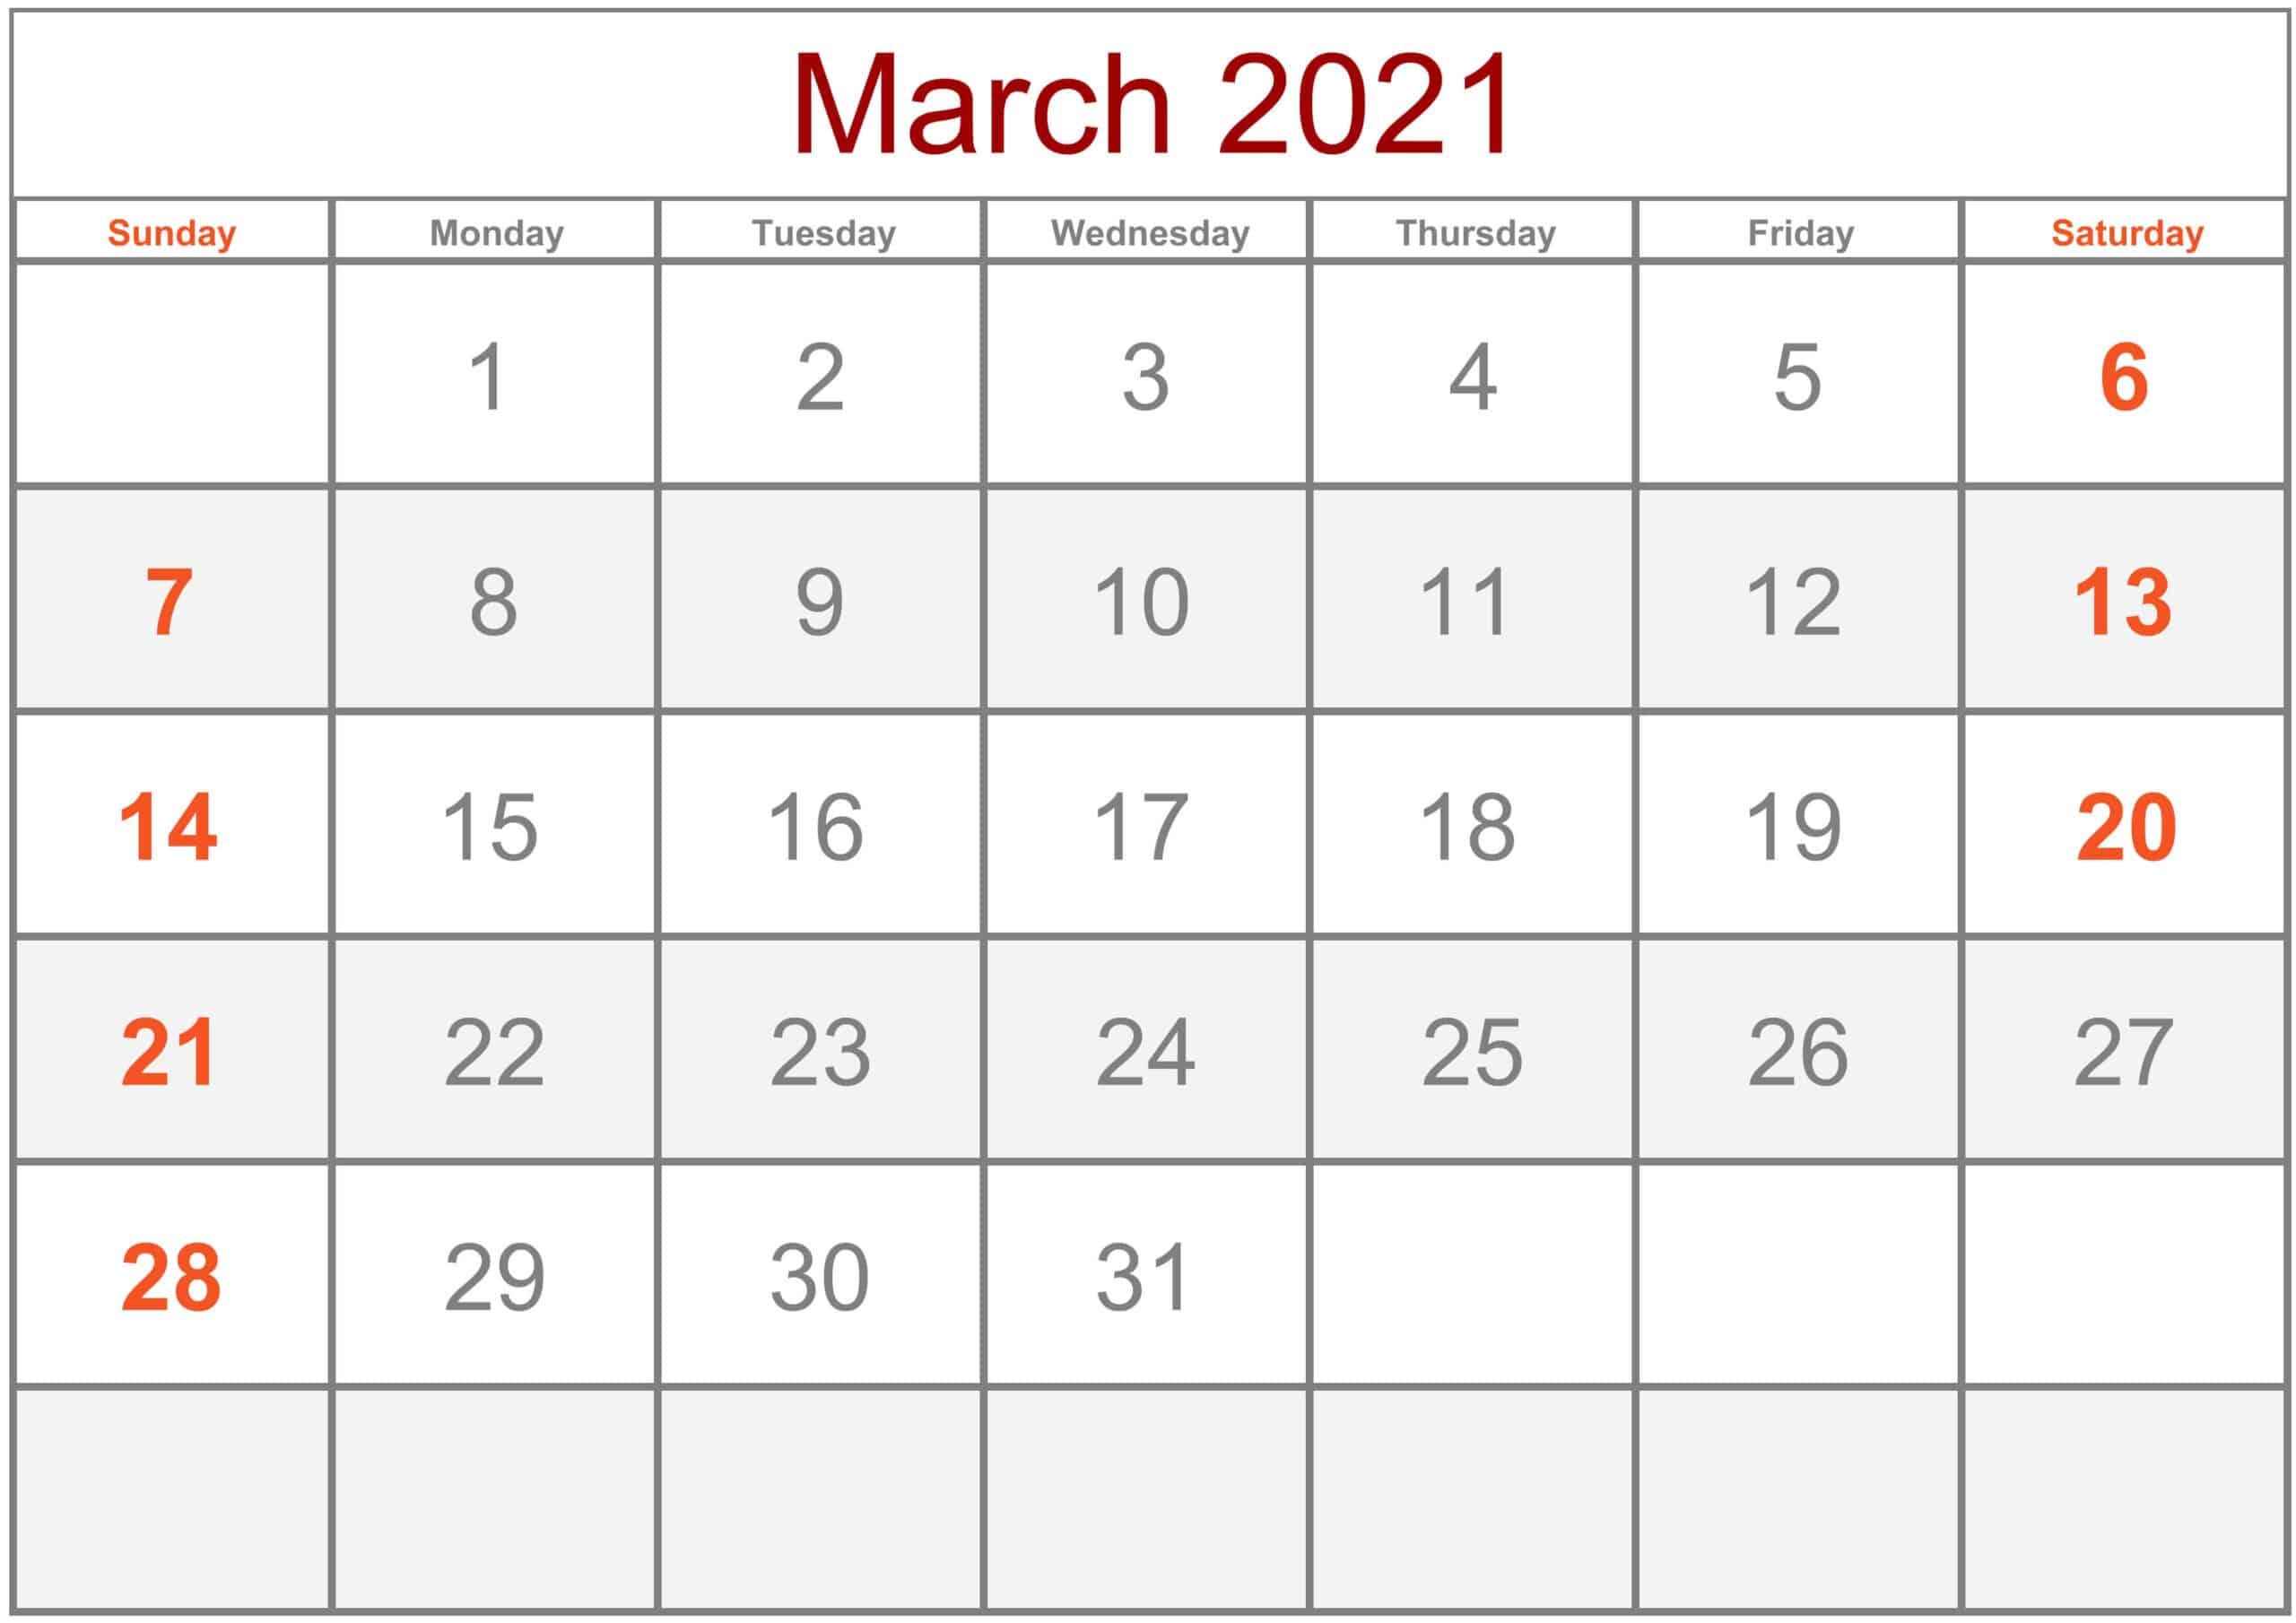 March 2021 Calendar Holidays